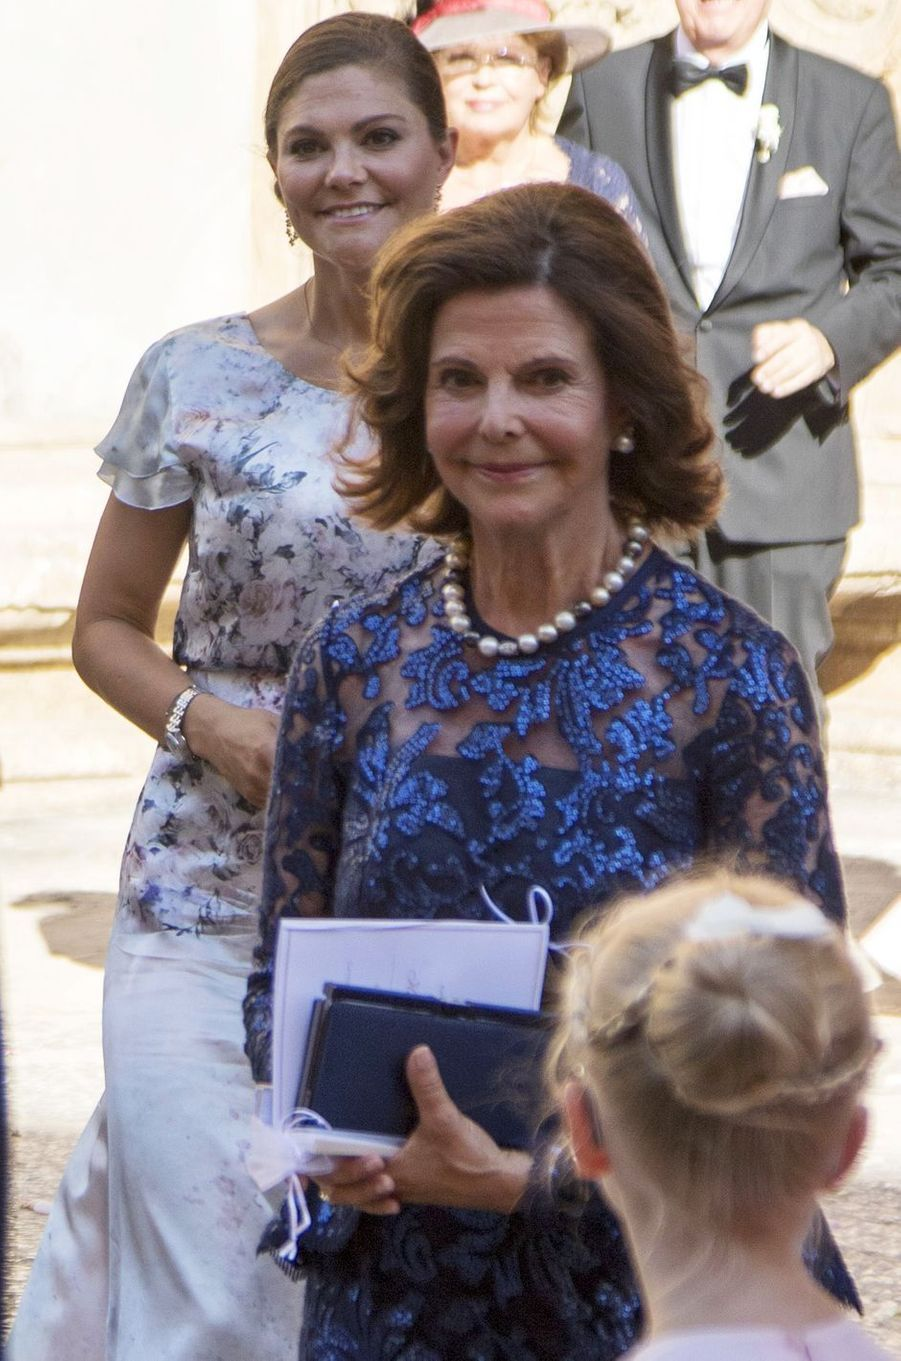 La princesse Victoria et la reine Silvia de Suède à Palma de Majorque, le 5 août 2017